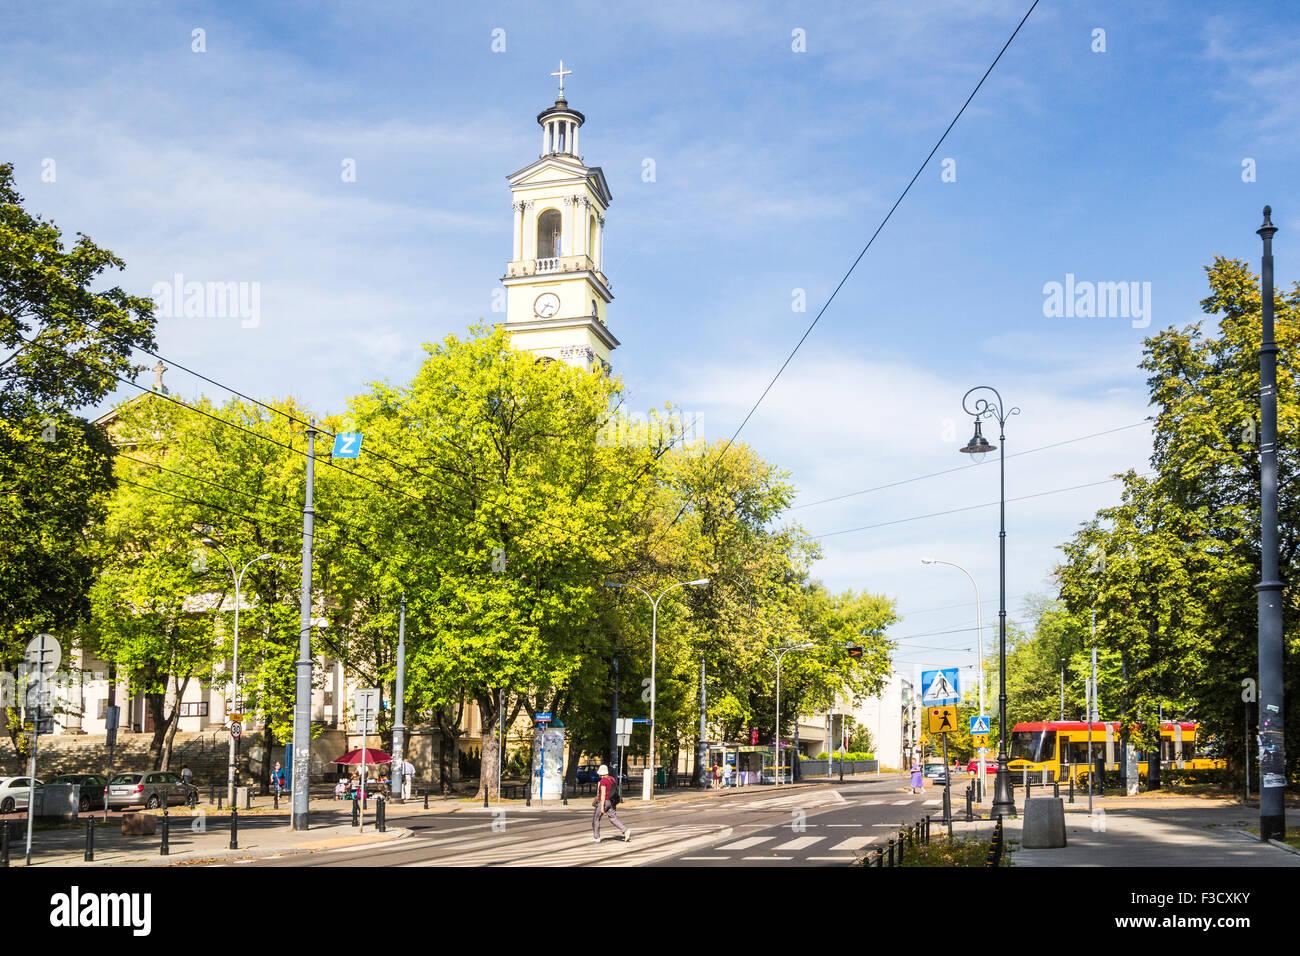 Poland Praga district neighbourhood Warsaw tree-lined wide street and church - Stock Image